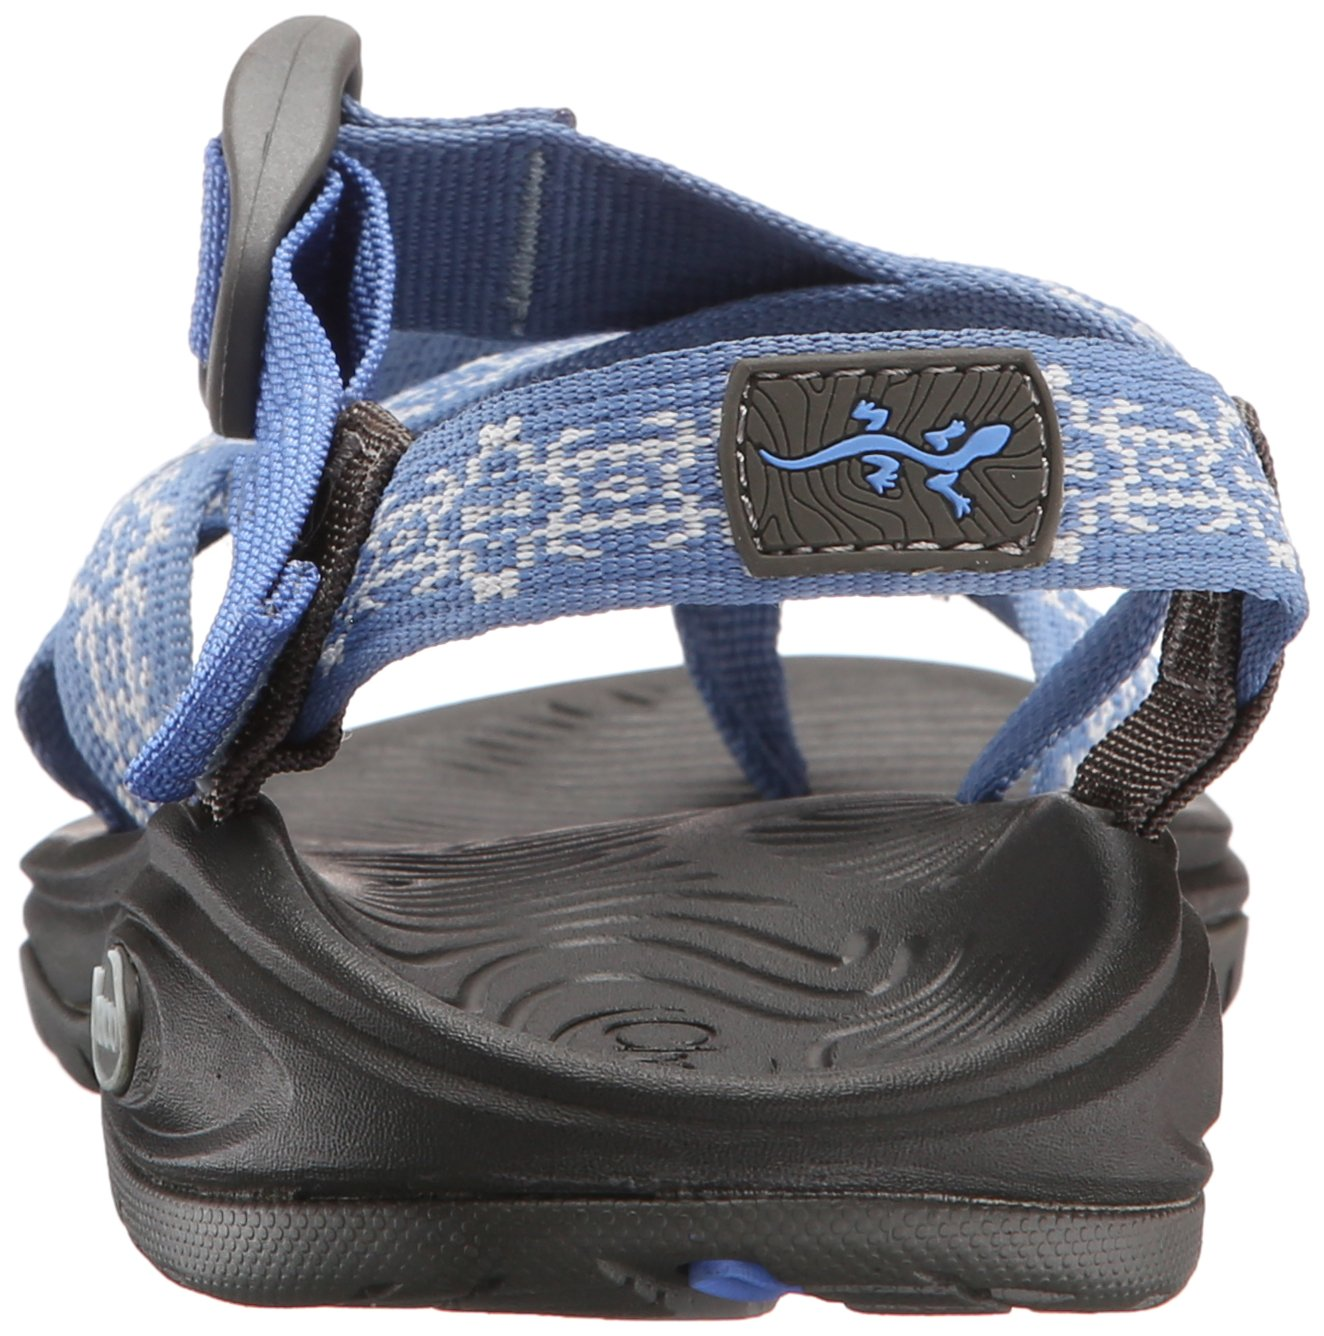 Chaco Women's Zvolv 2 Sport Sandal B011AOYX48 5 B(M) US|Celtic Azurite